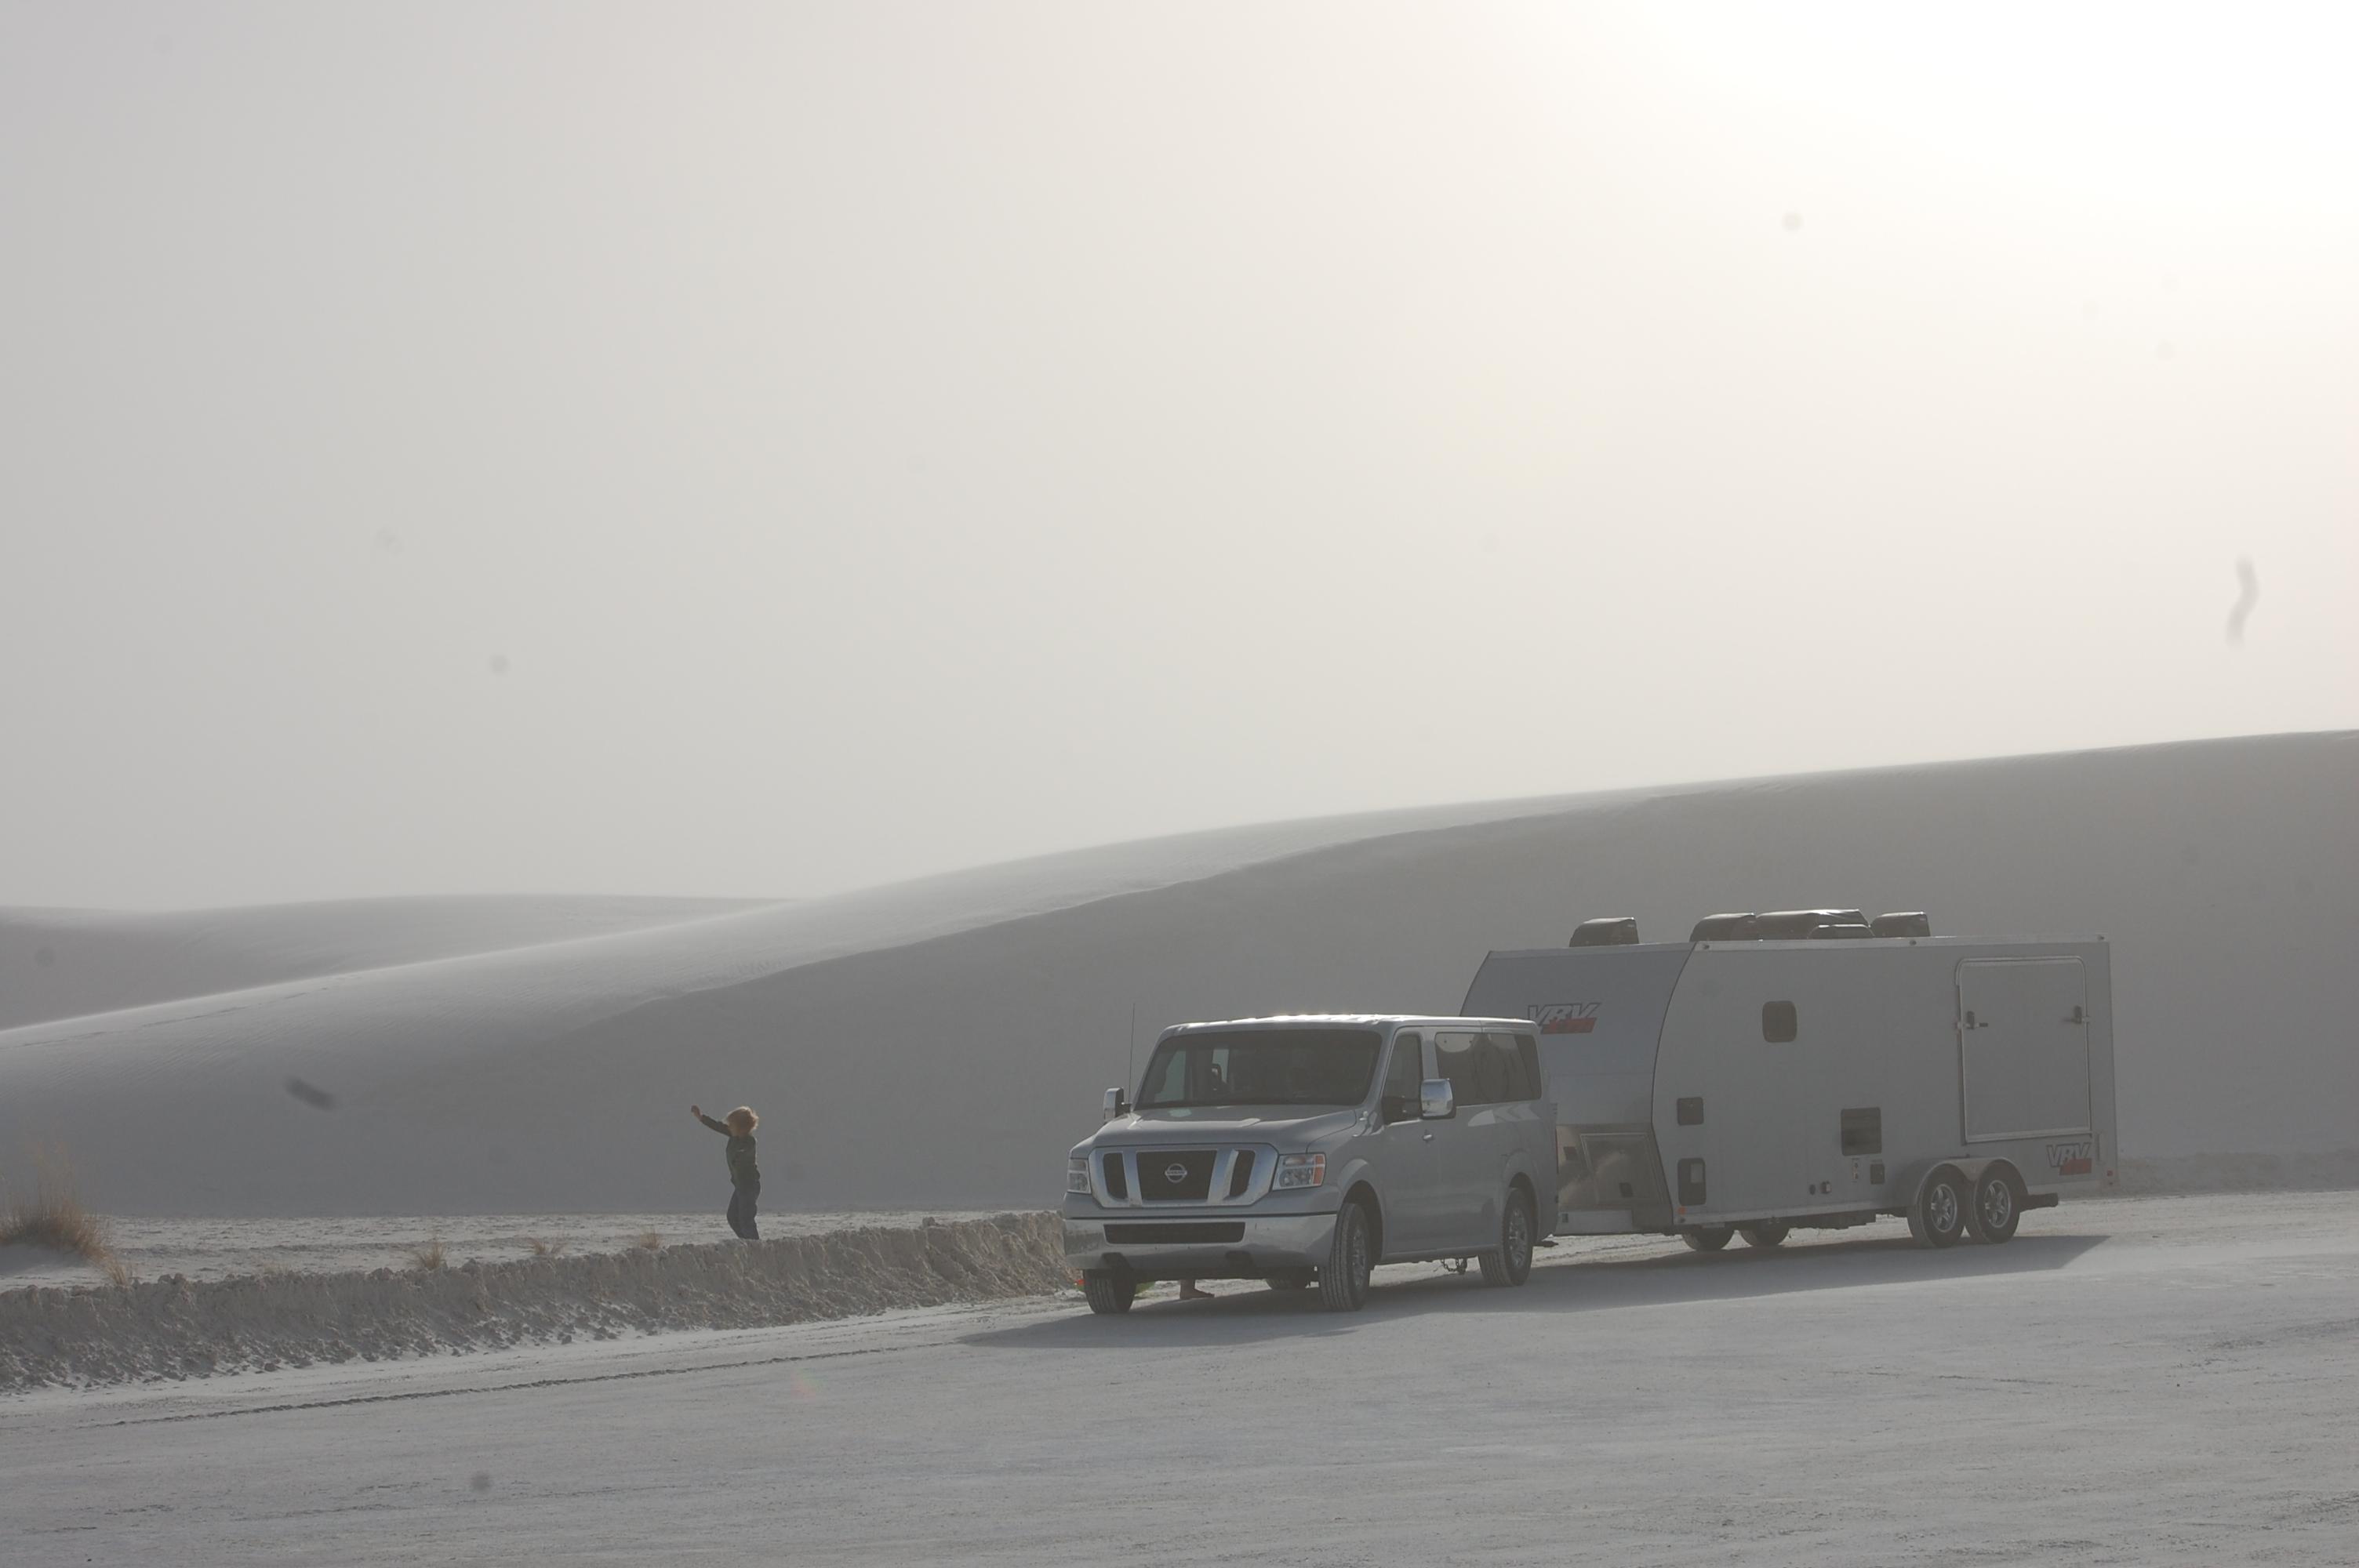 White Sands NM. VRV XTR 722 2014